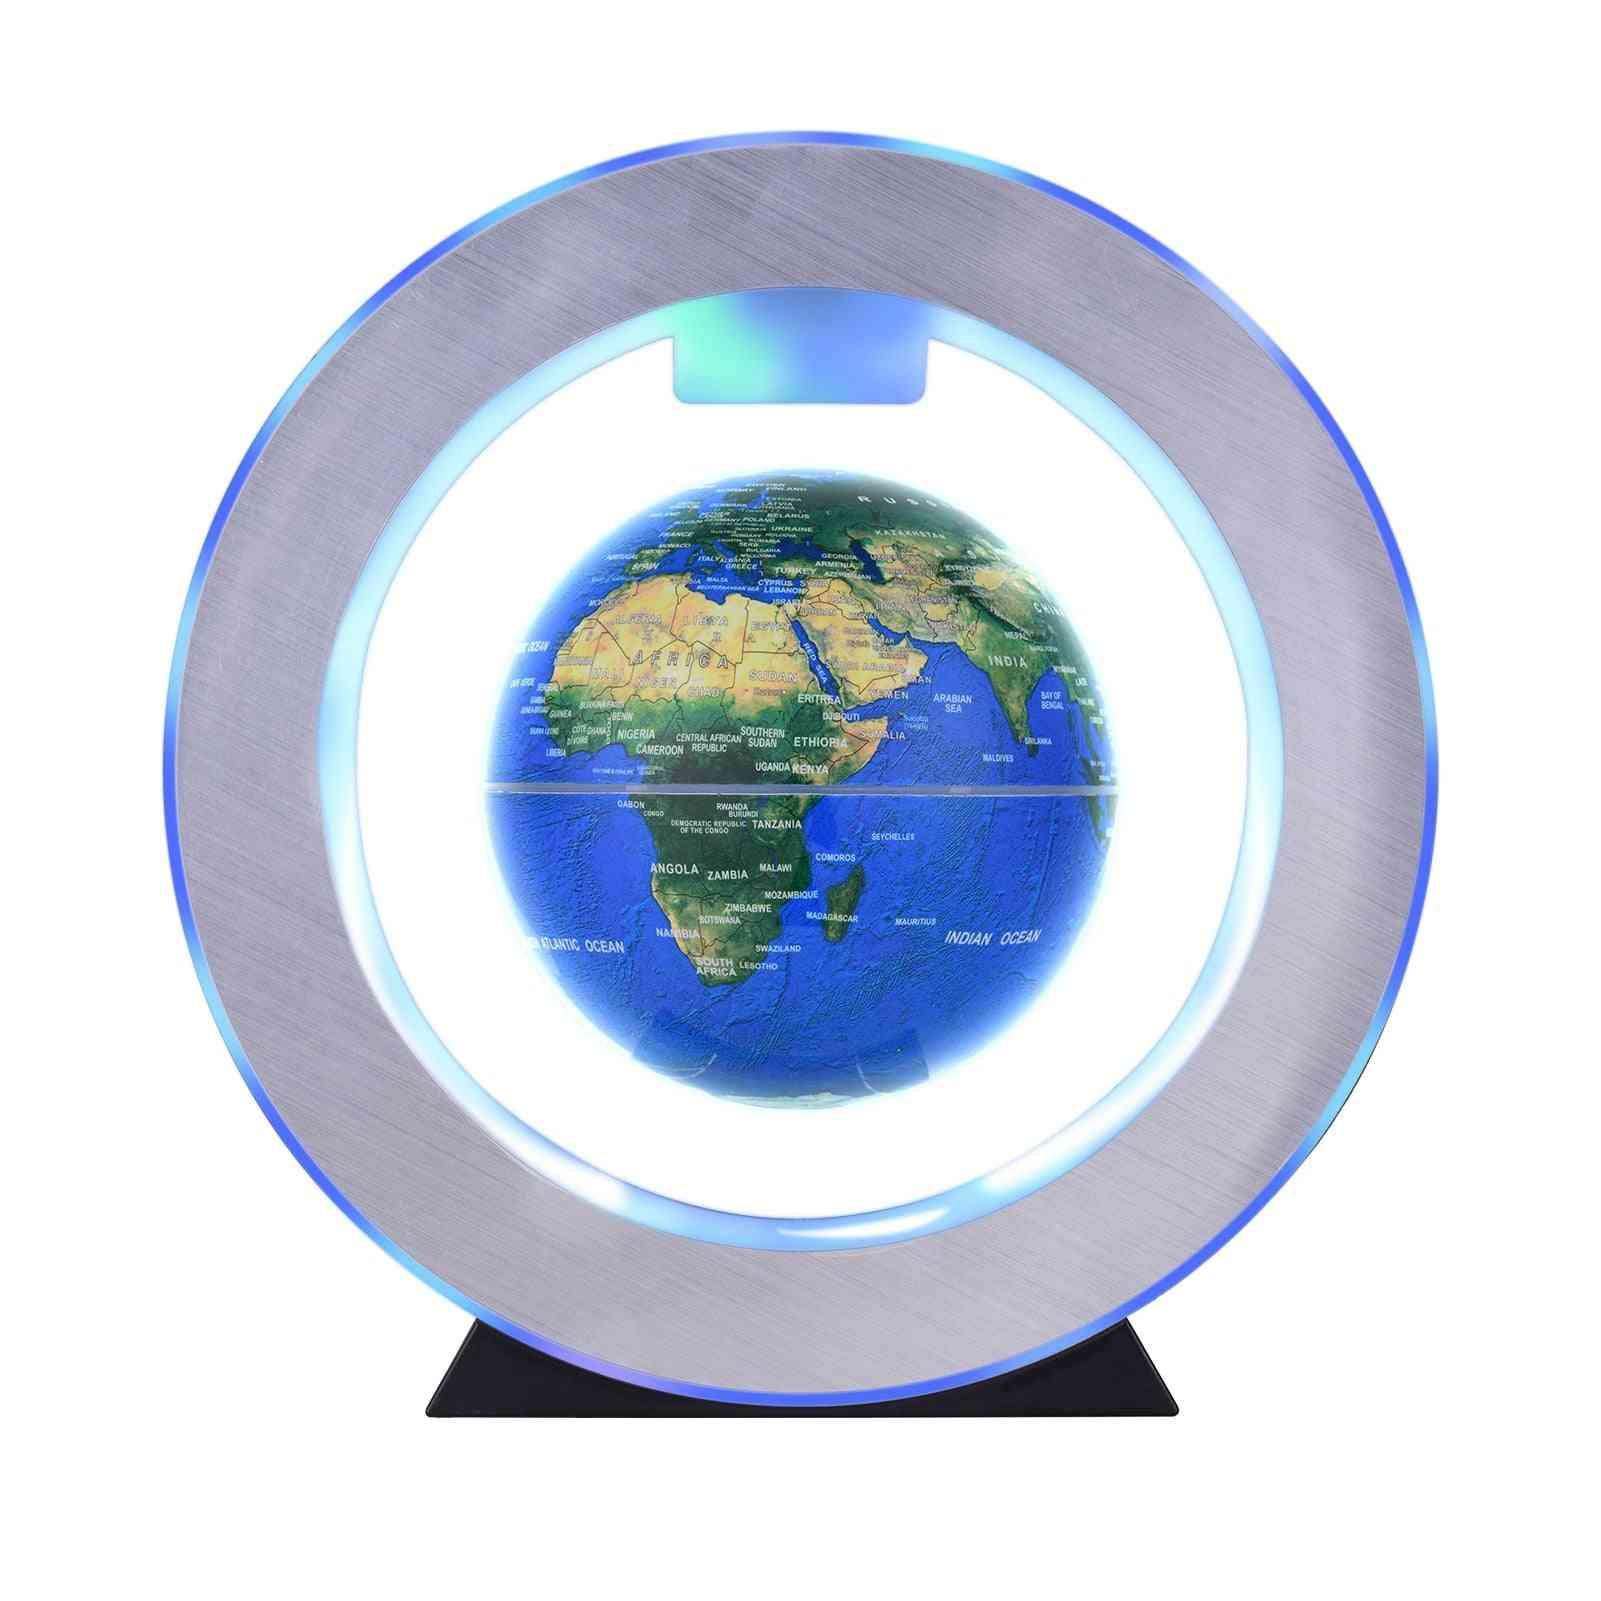 Magnetic Leviation Floating Globe Anti Gravity Rotating Earth Ball